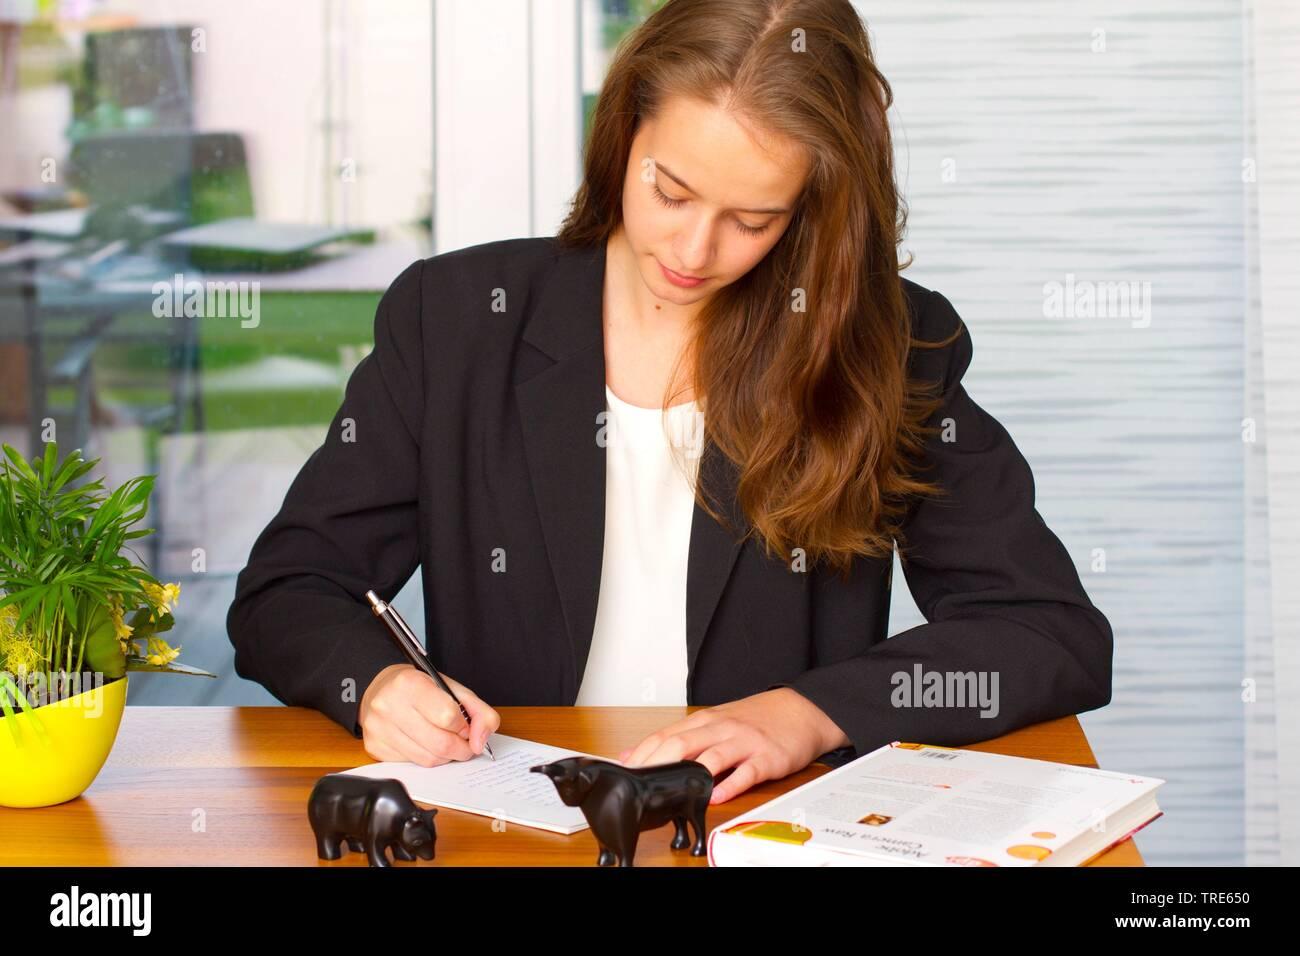 Portraet einer jungen Frau, am Schreibtisch arbeitend | Portrait of a young woman working at a desk | BLWS518267.jpg [ (c) blickwinkel/McPHOTO/A. Pulw - Stock Image